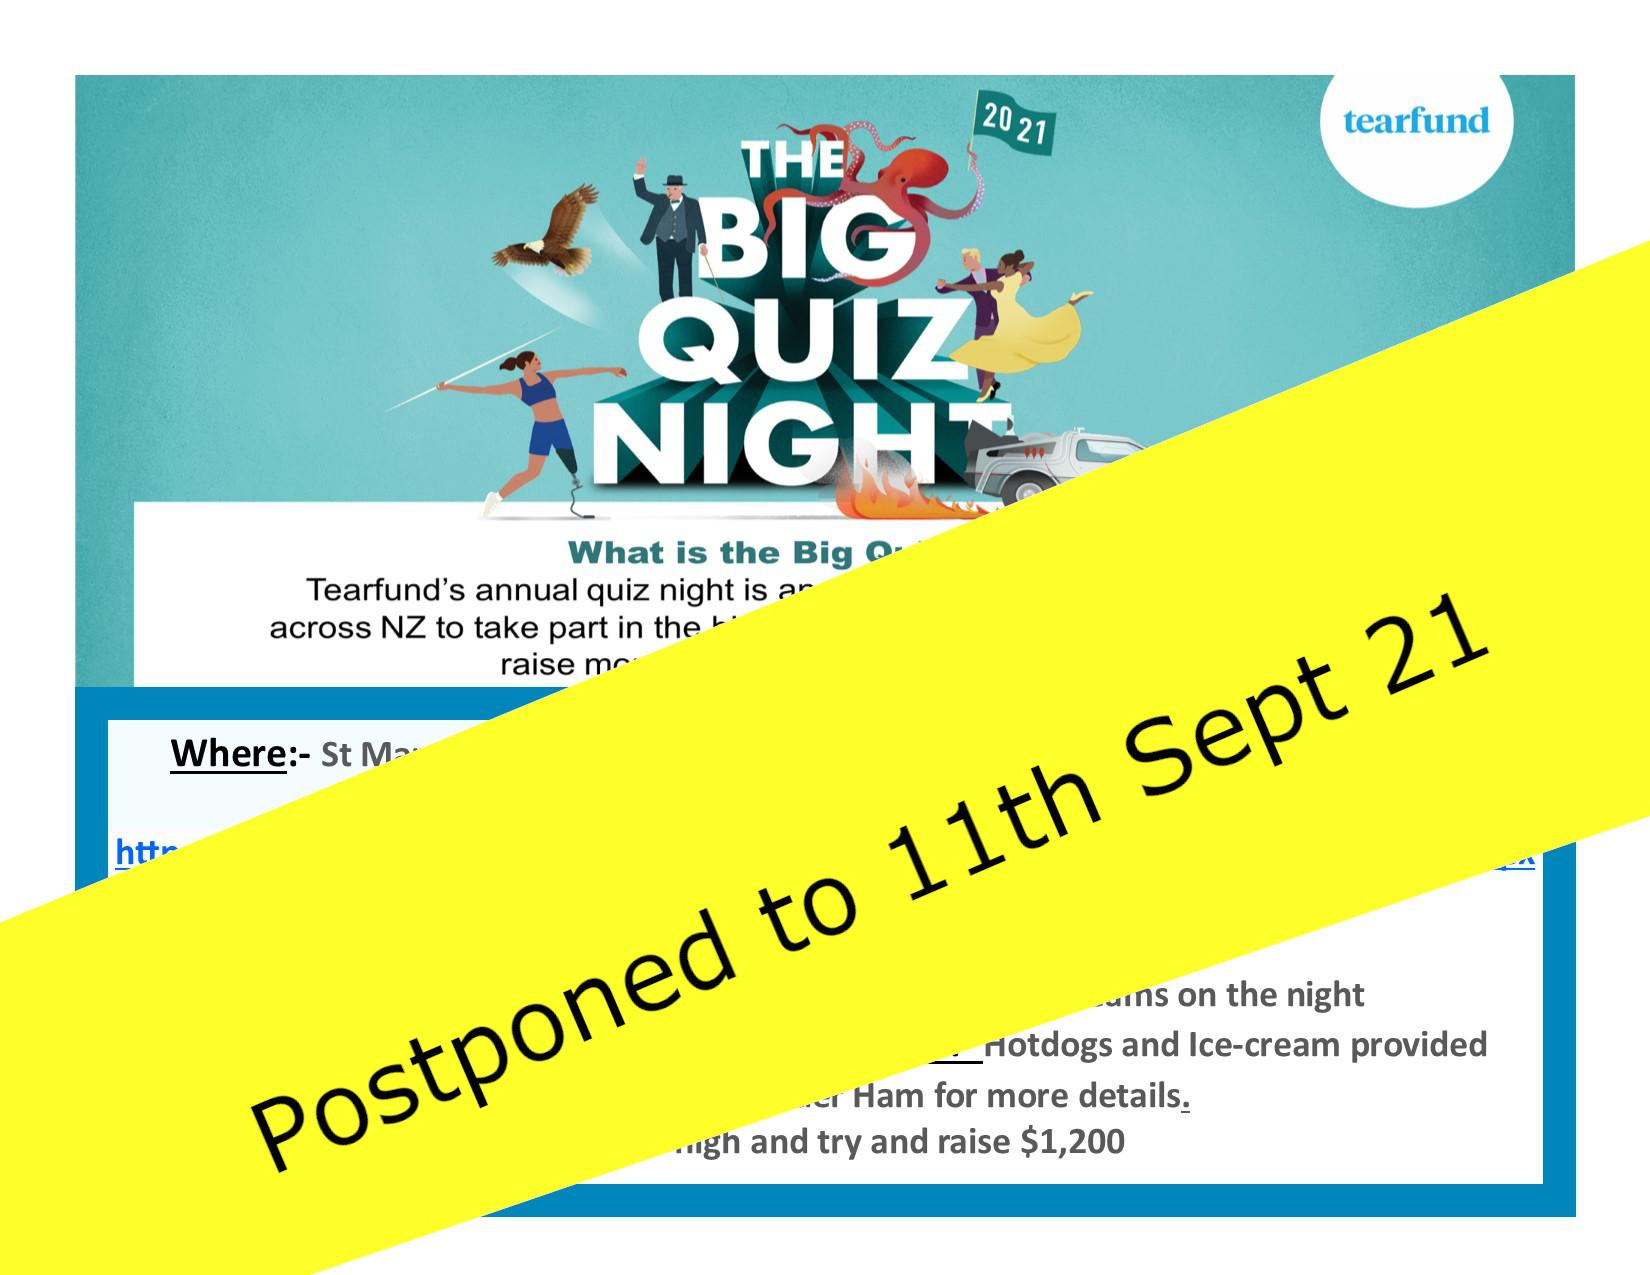 BIg-Quiz-night-advert-postponed